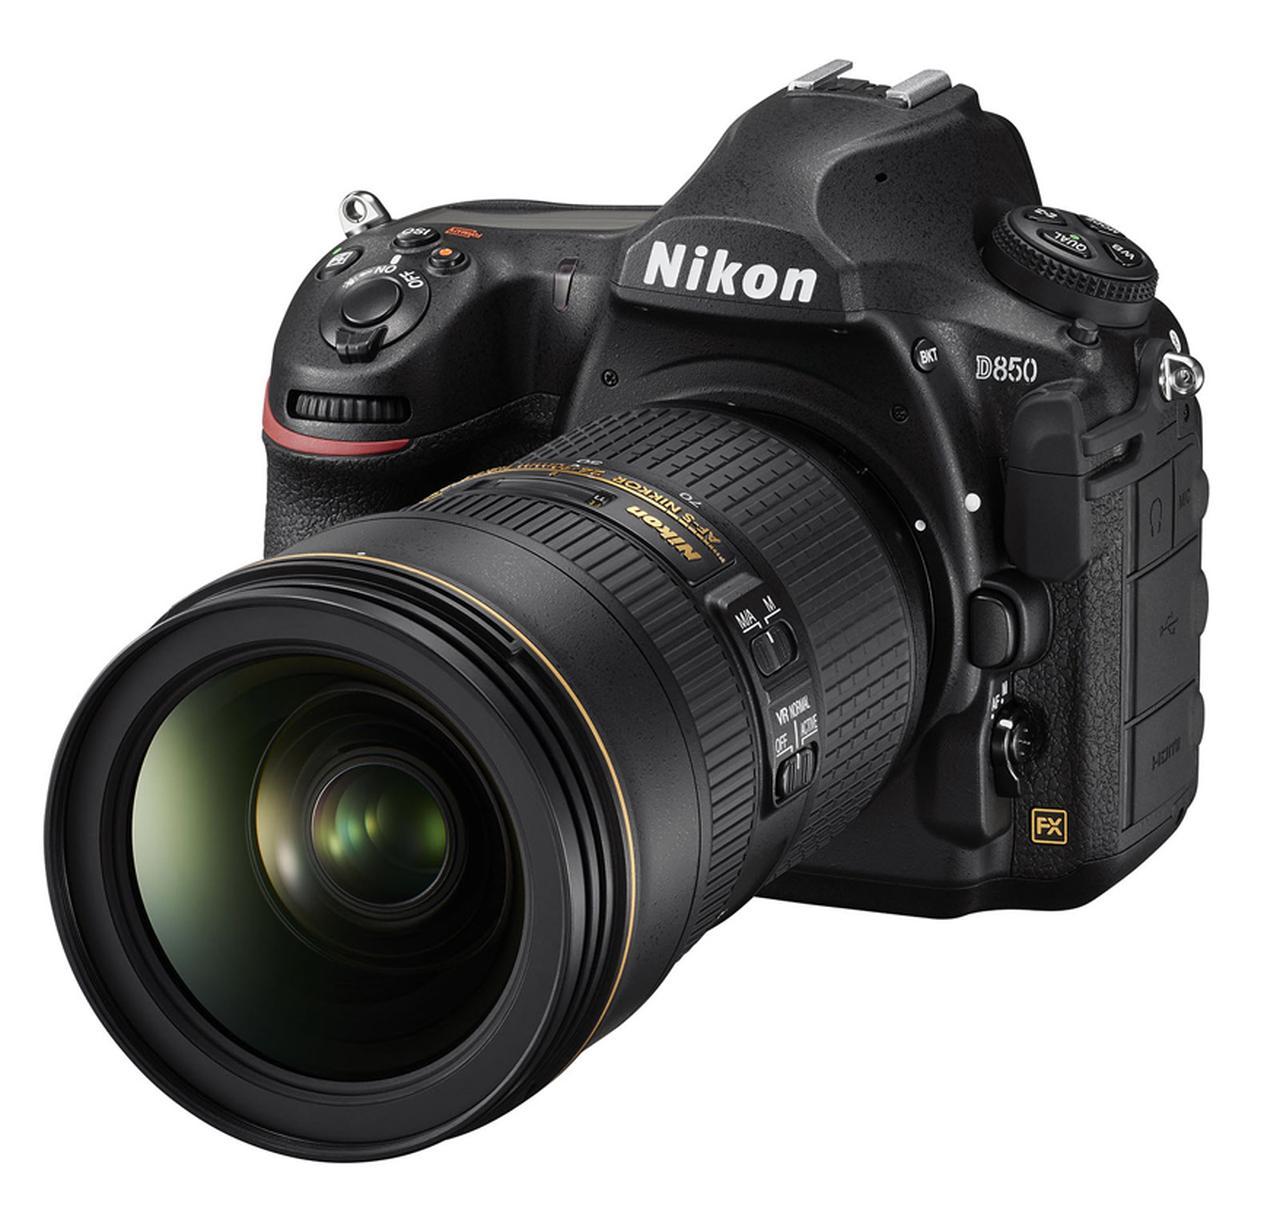 画像: ▲D850にAF-S NIKKOR 24-70mmf/2.8E ED VRを装着した状態。 www.nikon-image.com